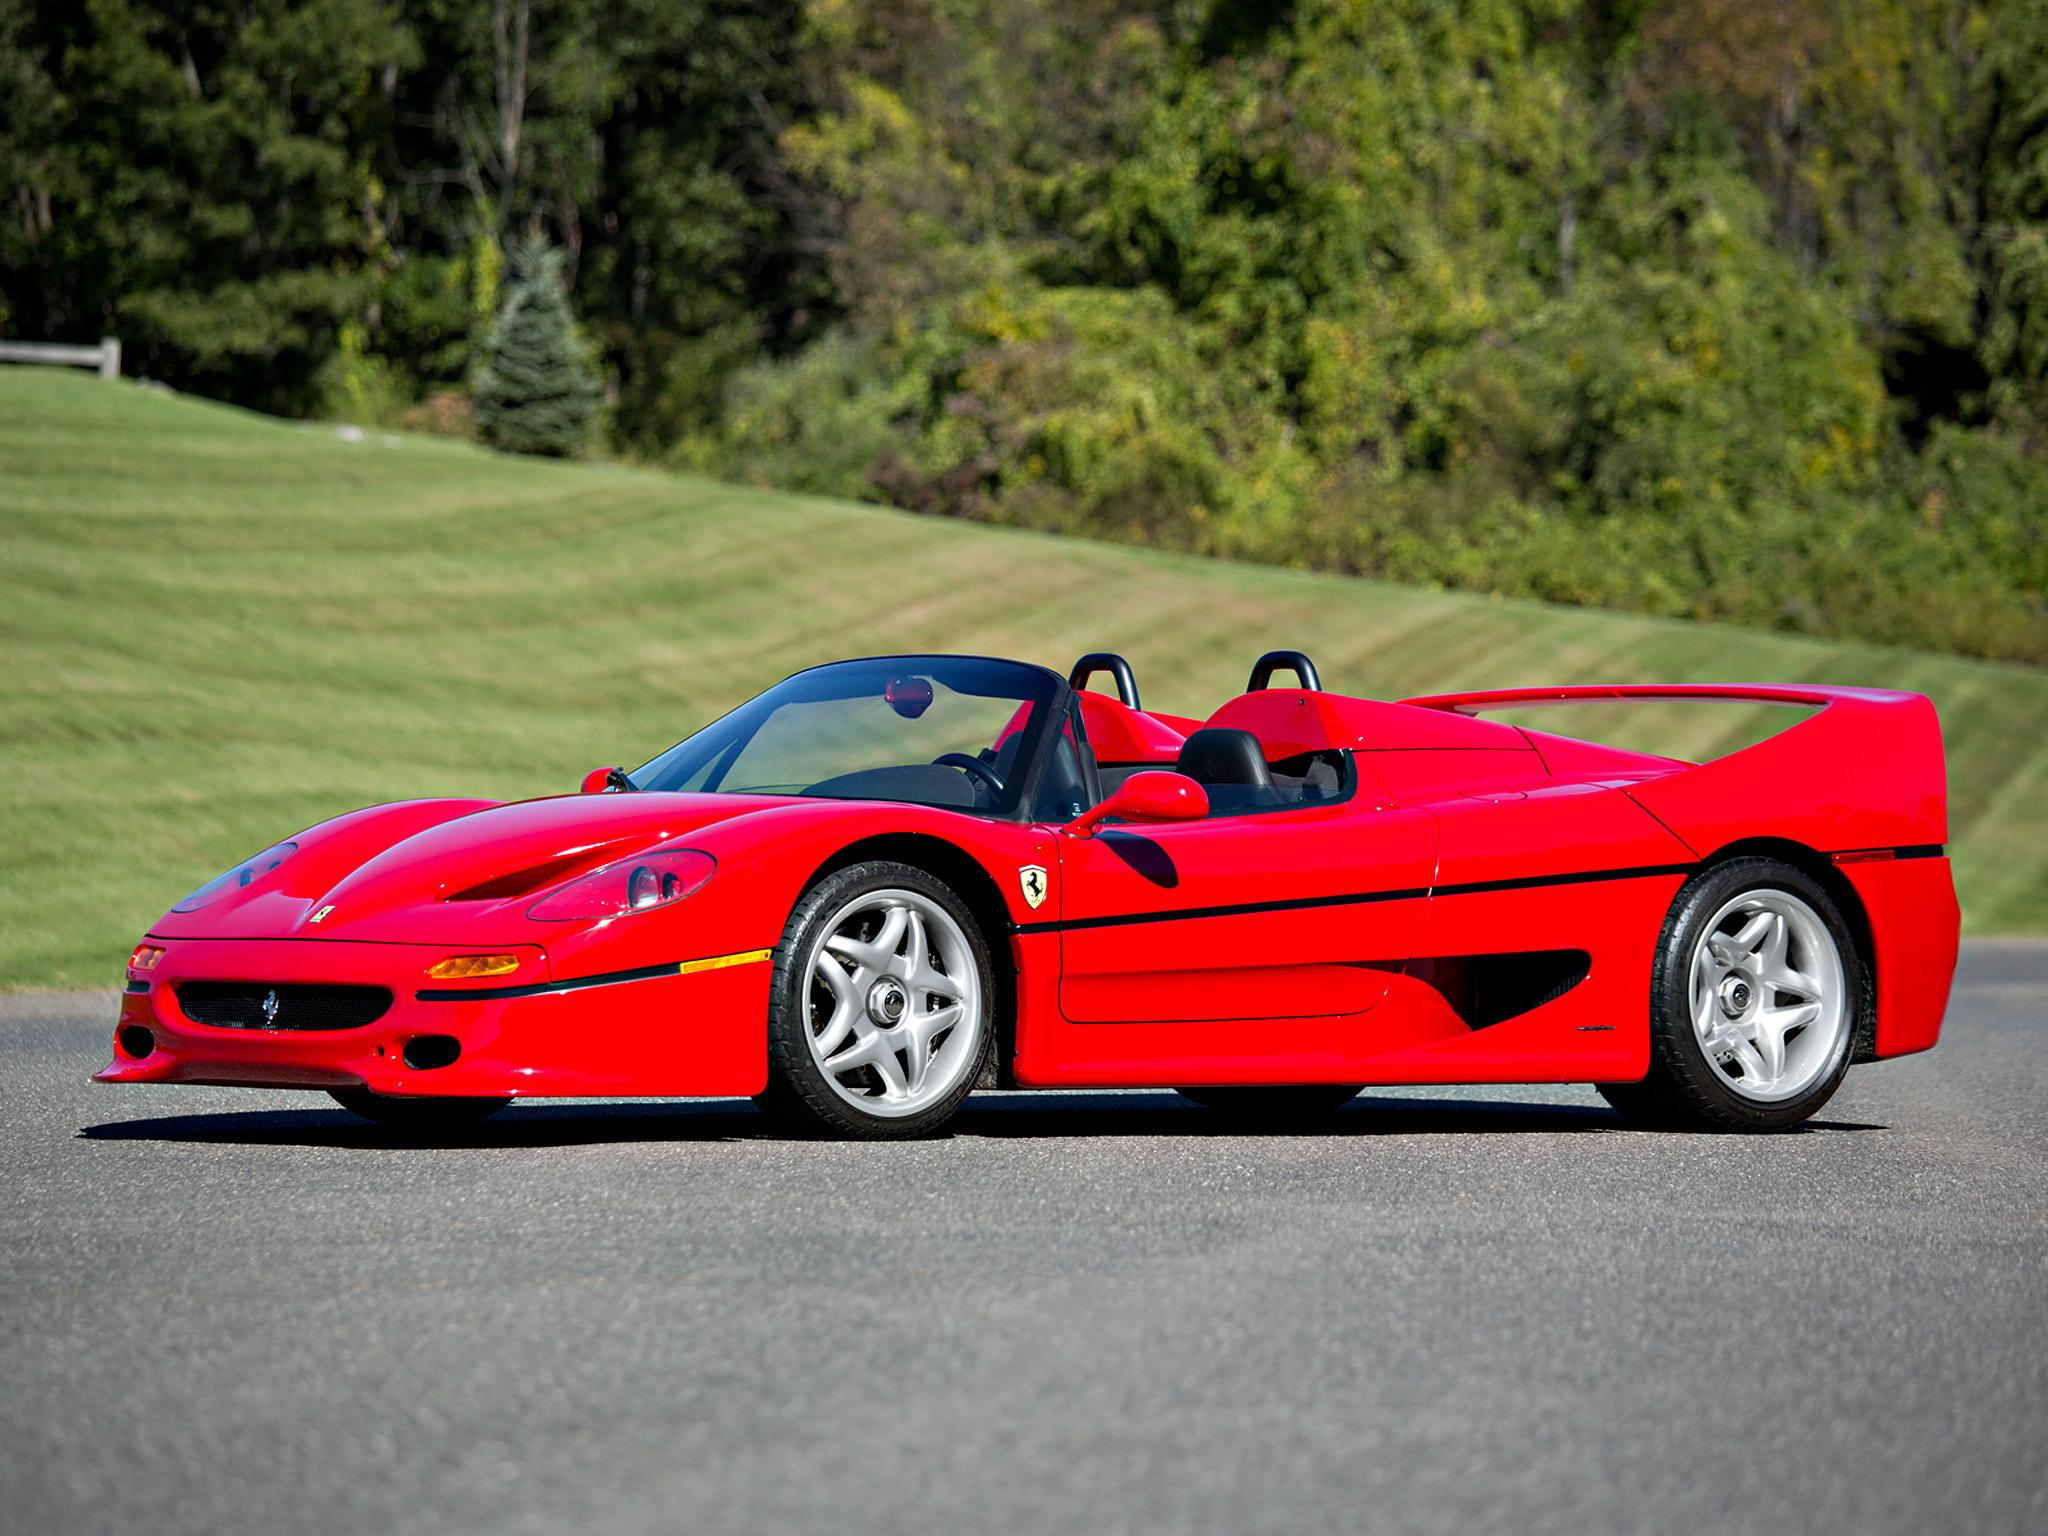 Ferrari F50 Wallpapers Vehicles Hq Ferrari F50 Pictures 4k Wallpapers 2019